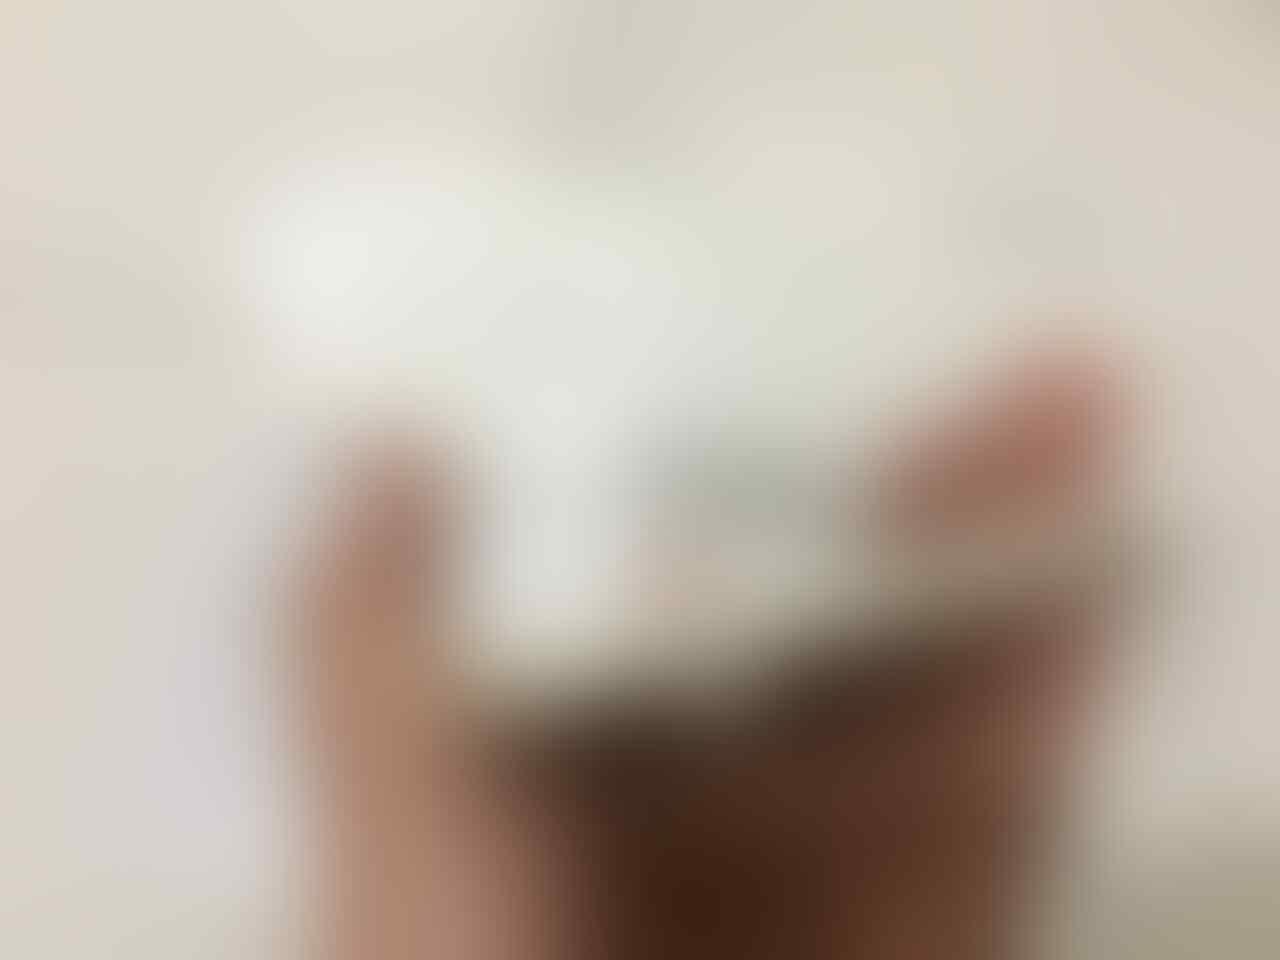 IPHONE 6 GOLD 16GB FU FULLSET MULUSS NORMAL SILENT MURAAAHH 2650 SAJA [MALANG]